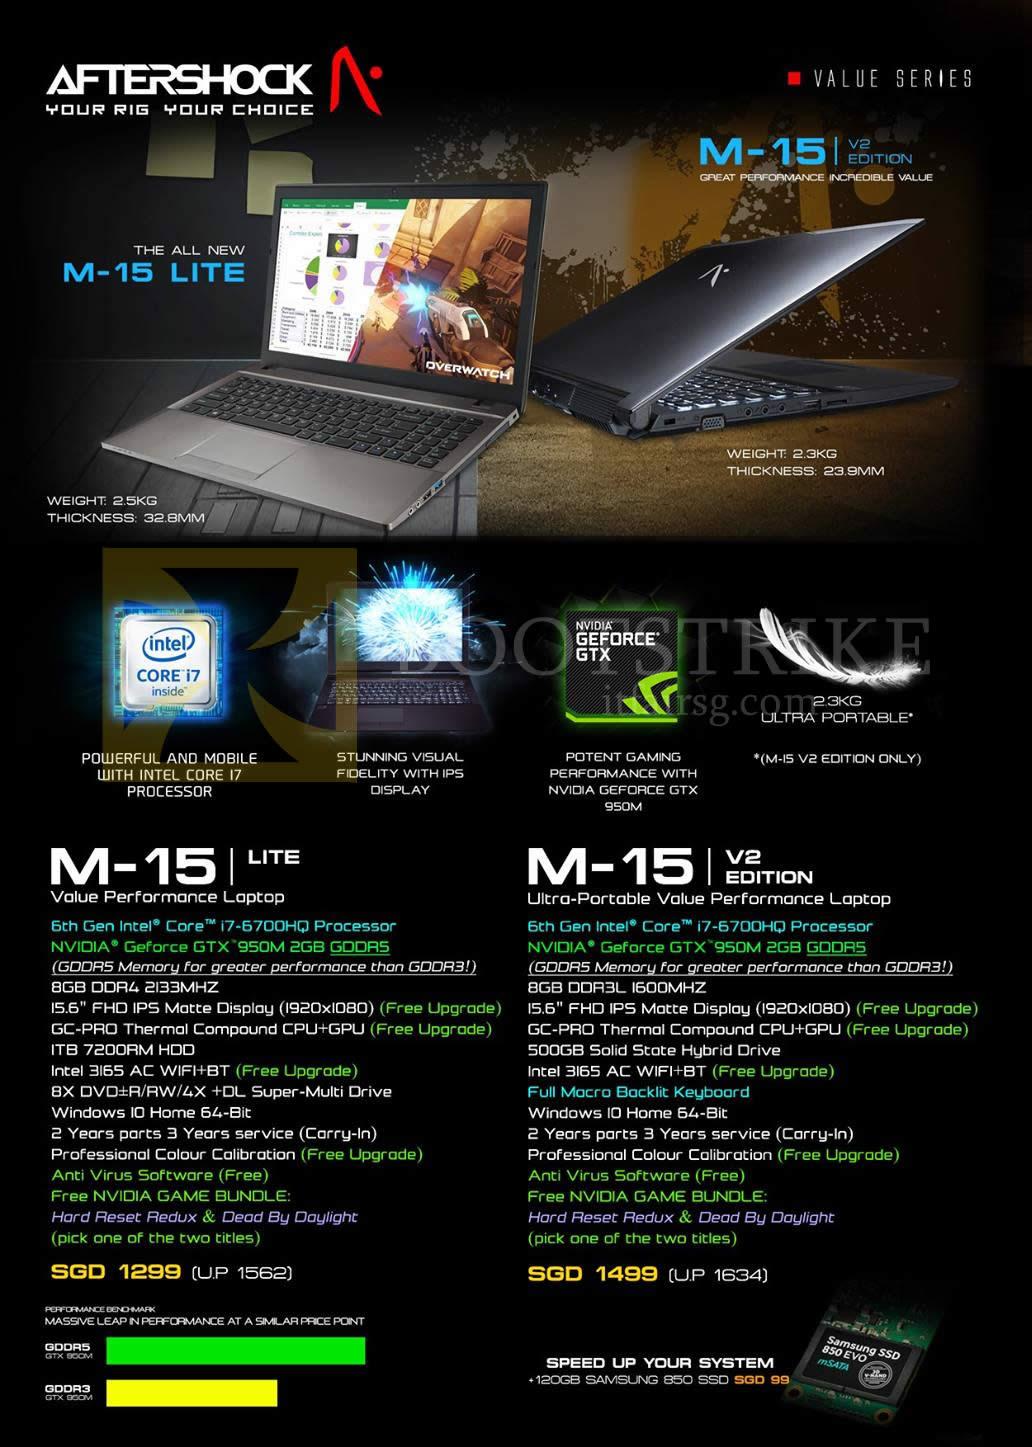 COMEX 2016 price list image brochure of Aftershock Notebooks M-15 Lite, M-15 V2 Edition